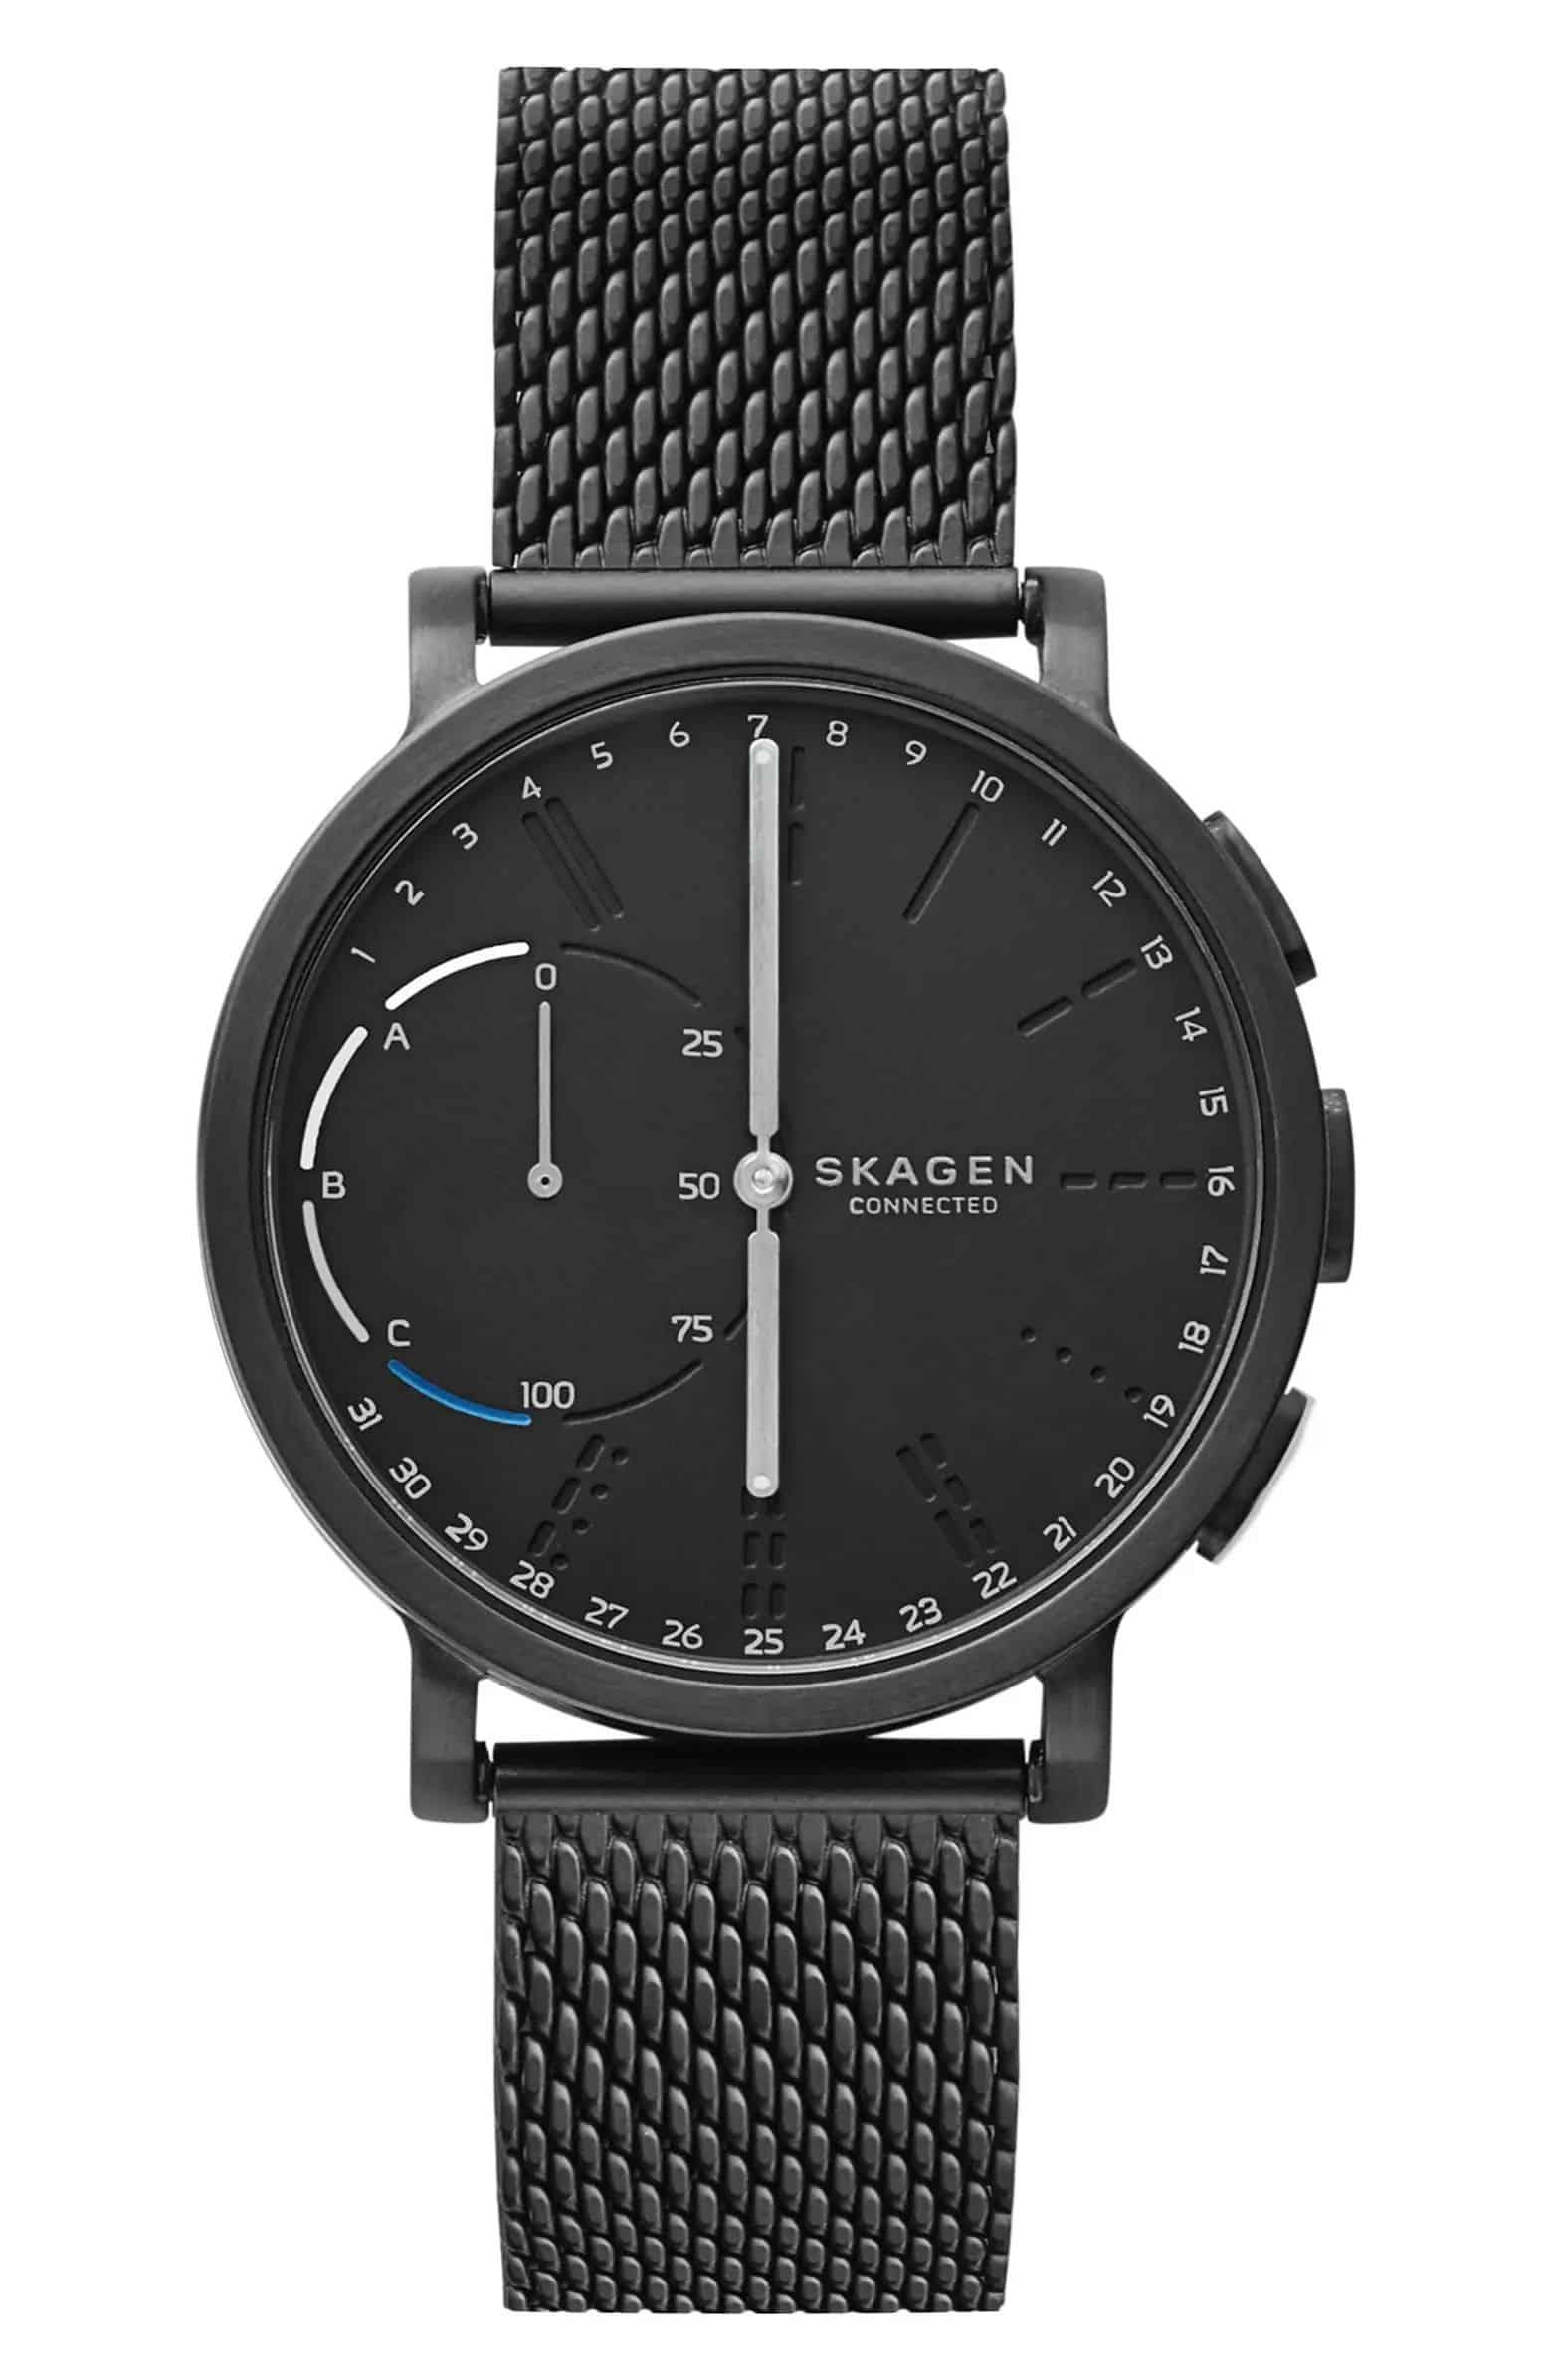 skagen connected smartwatch